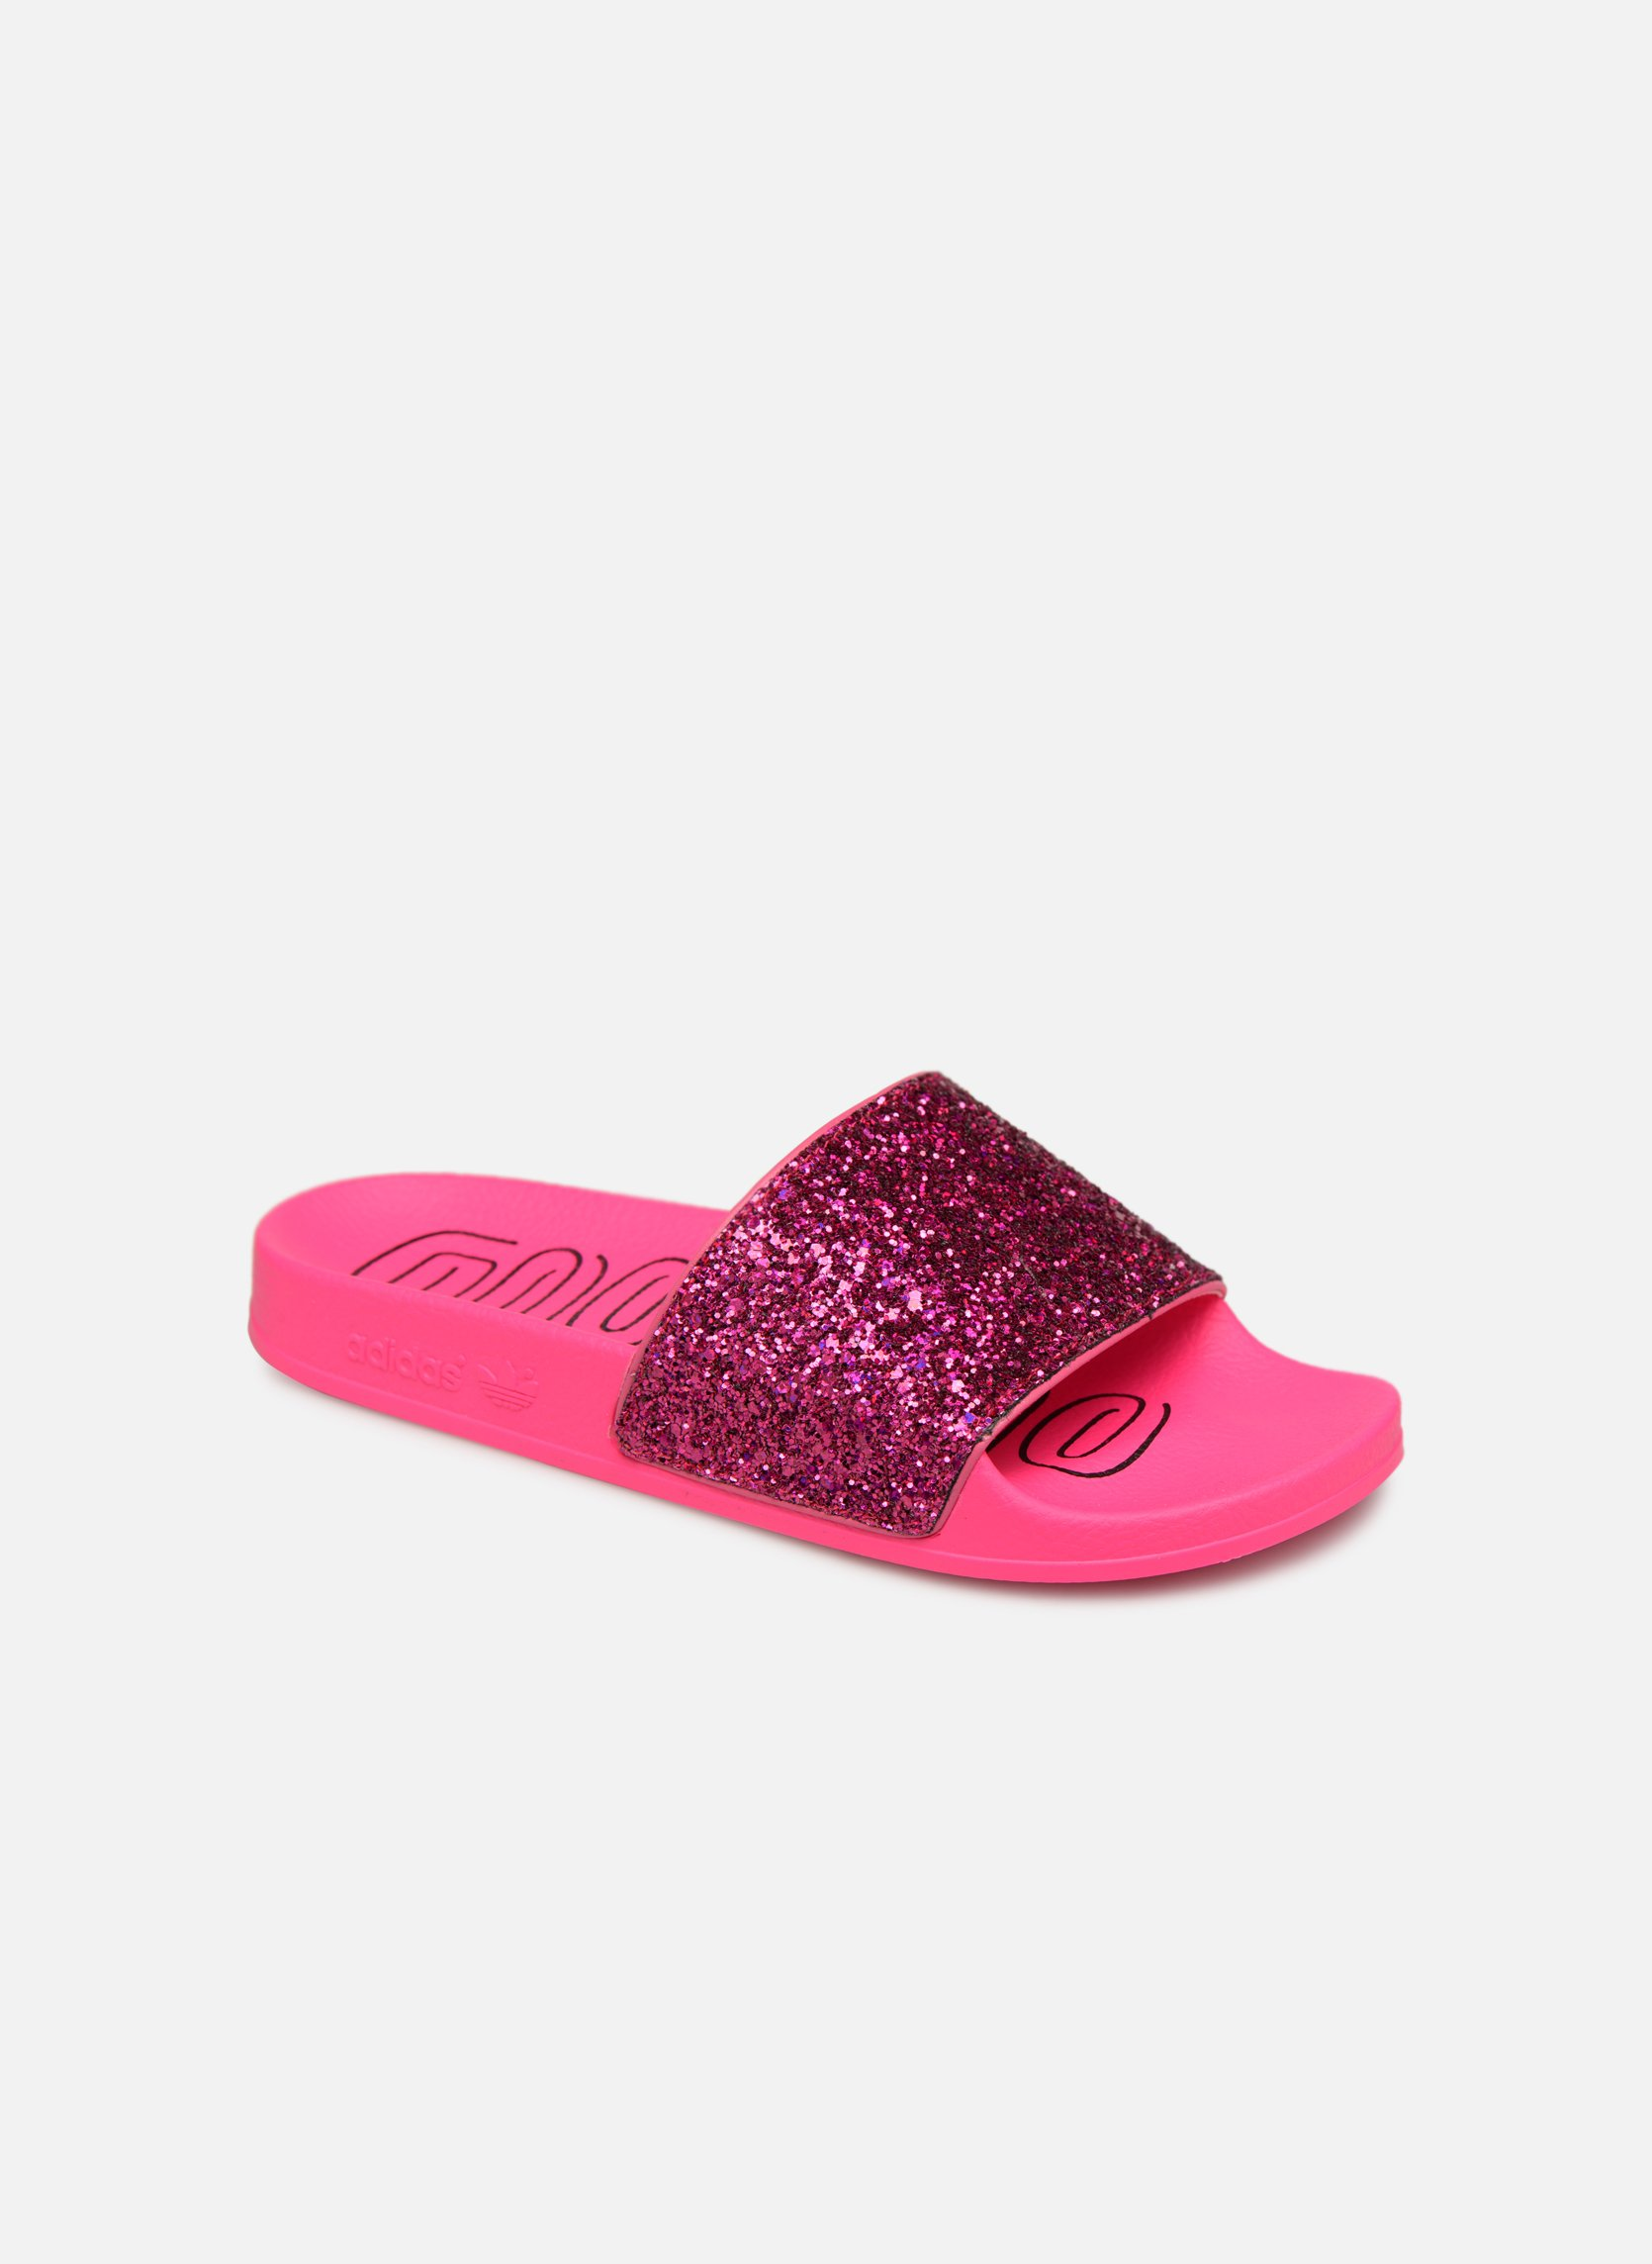 Wedges Adidas Originals Roze